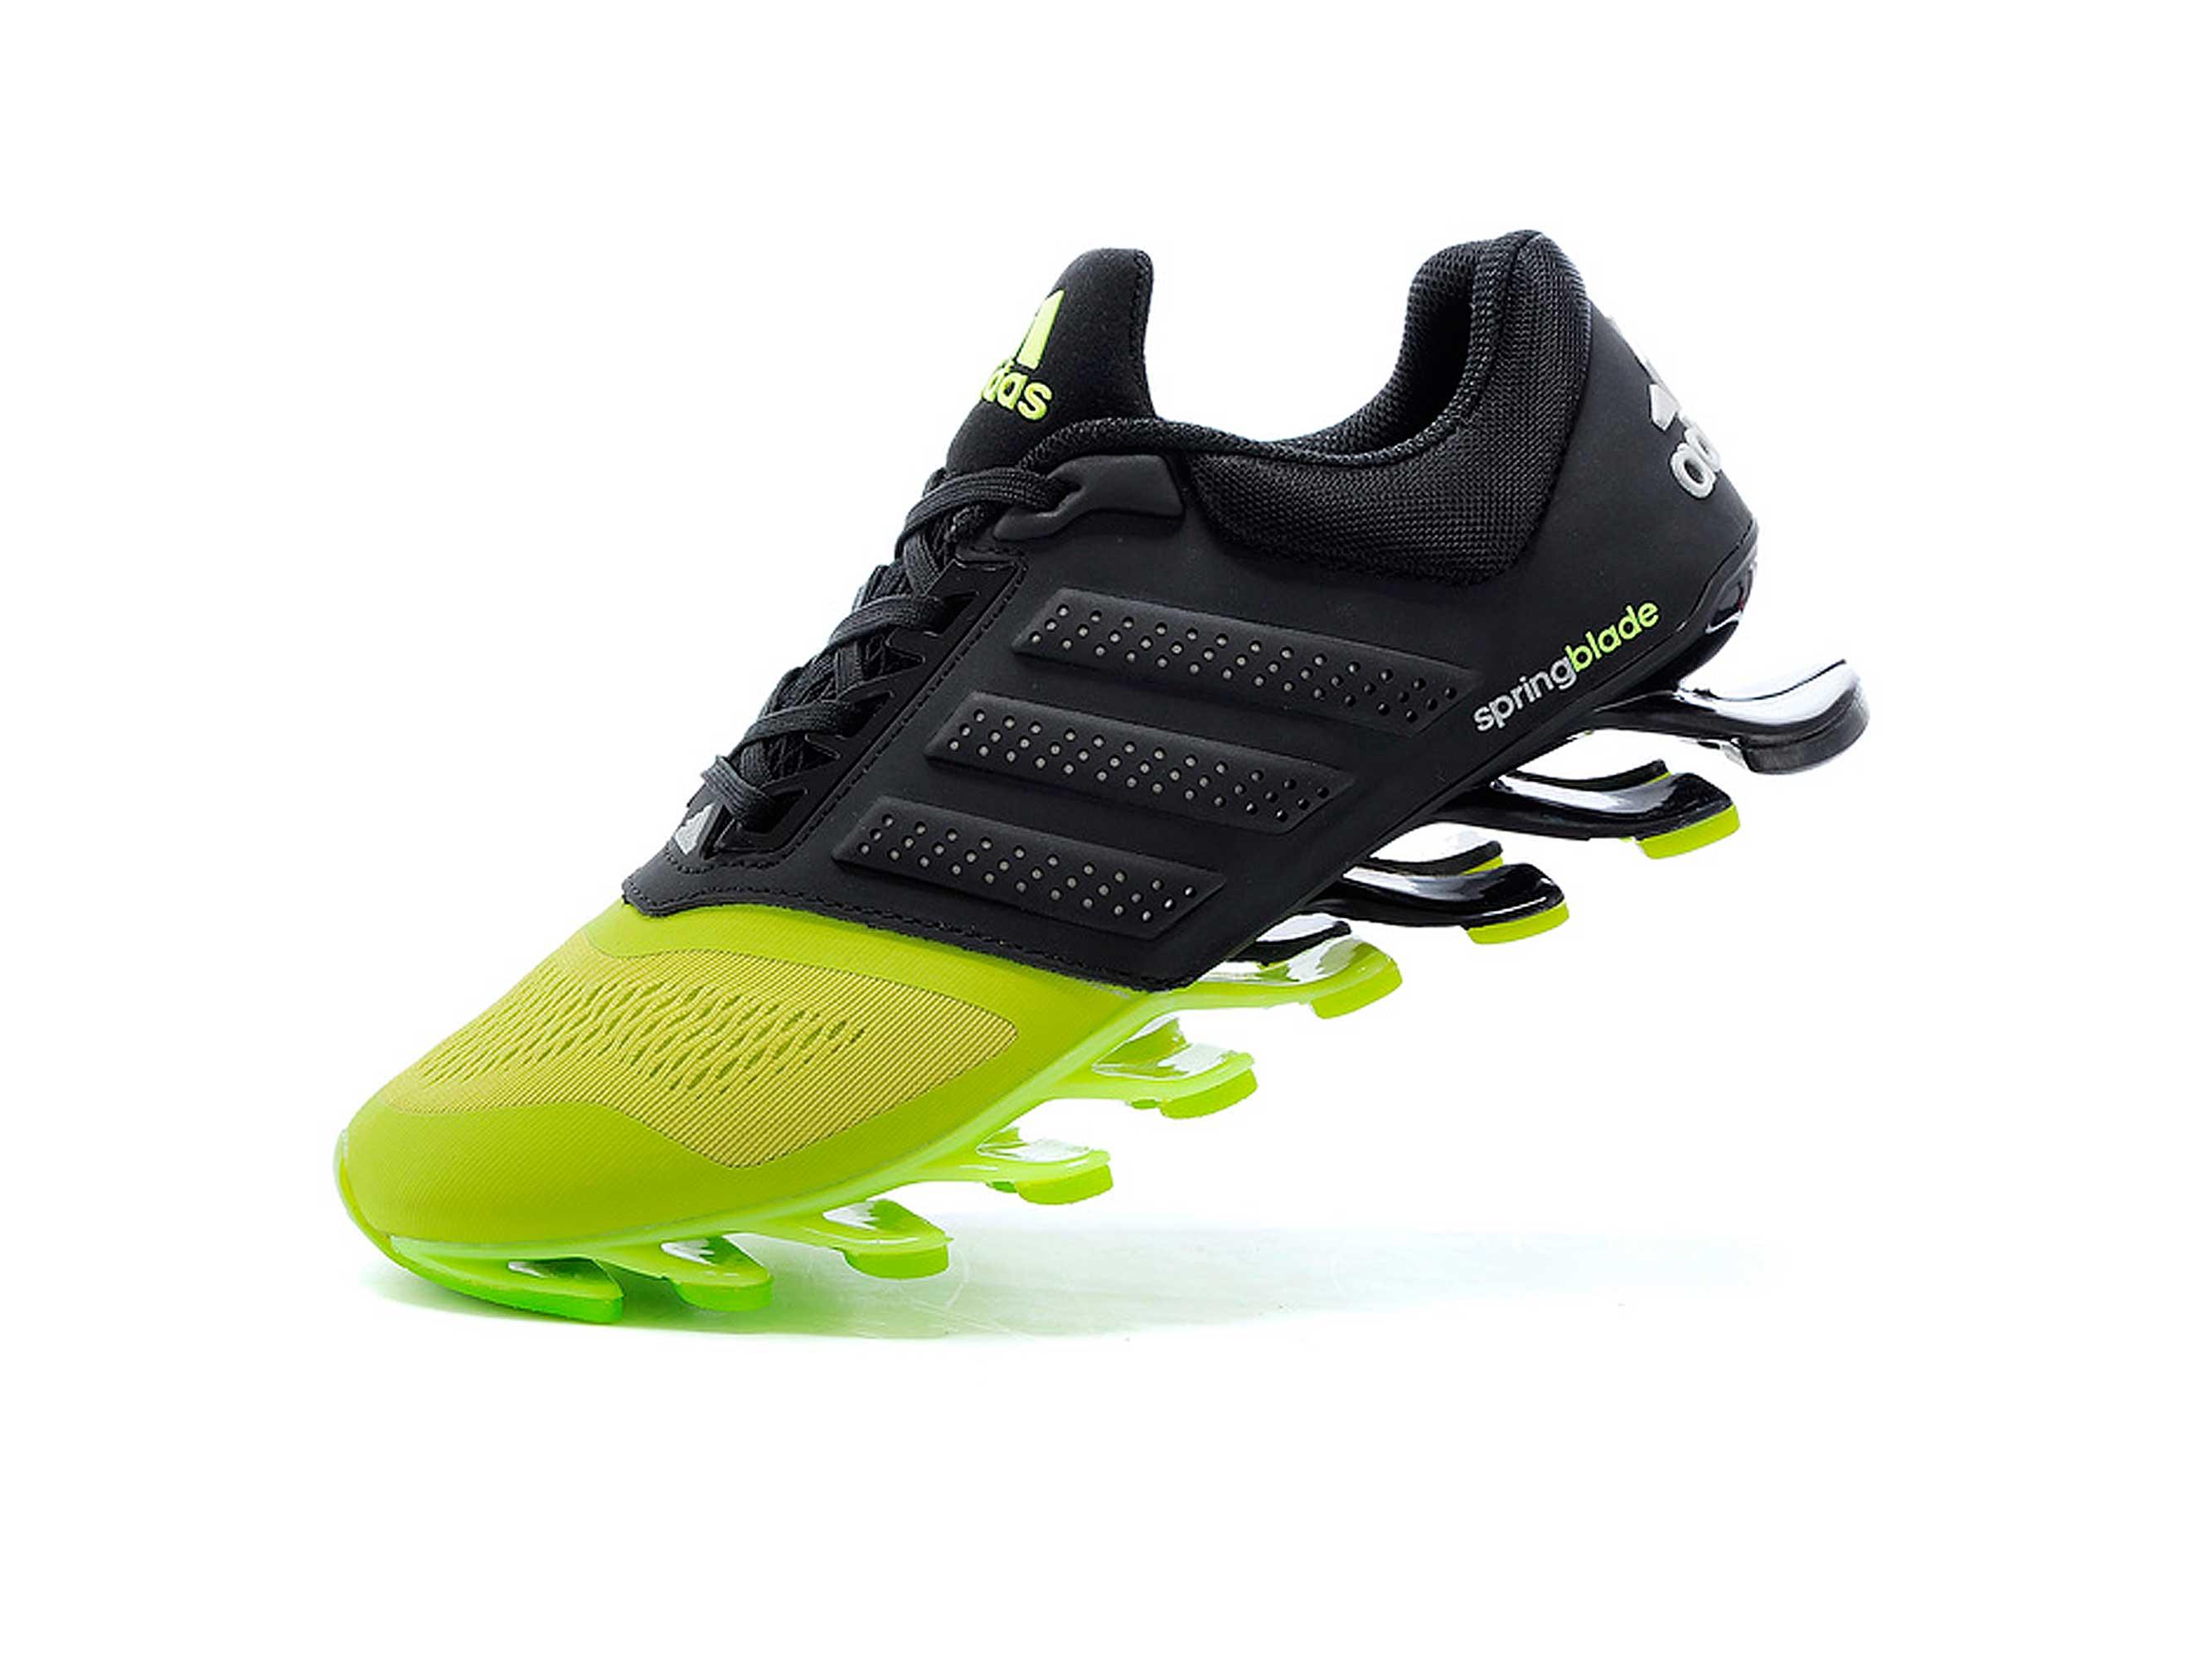 Adidas springblade купить